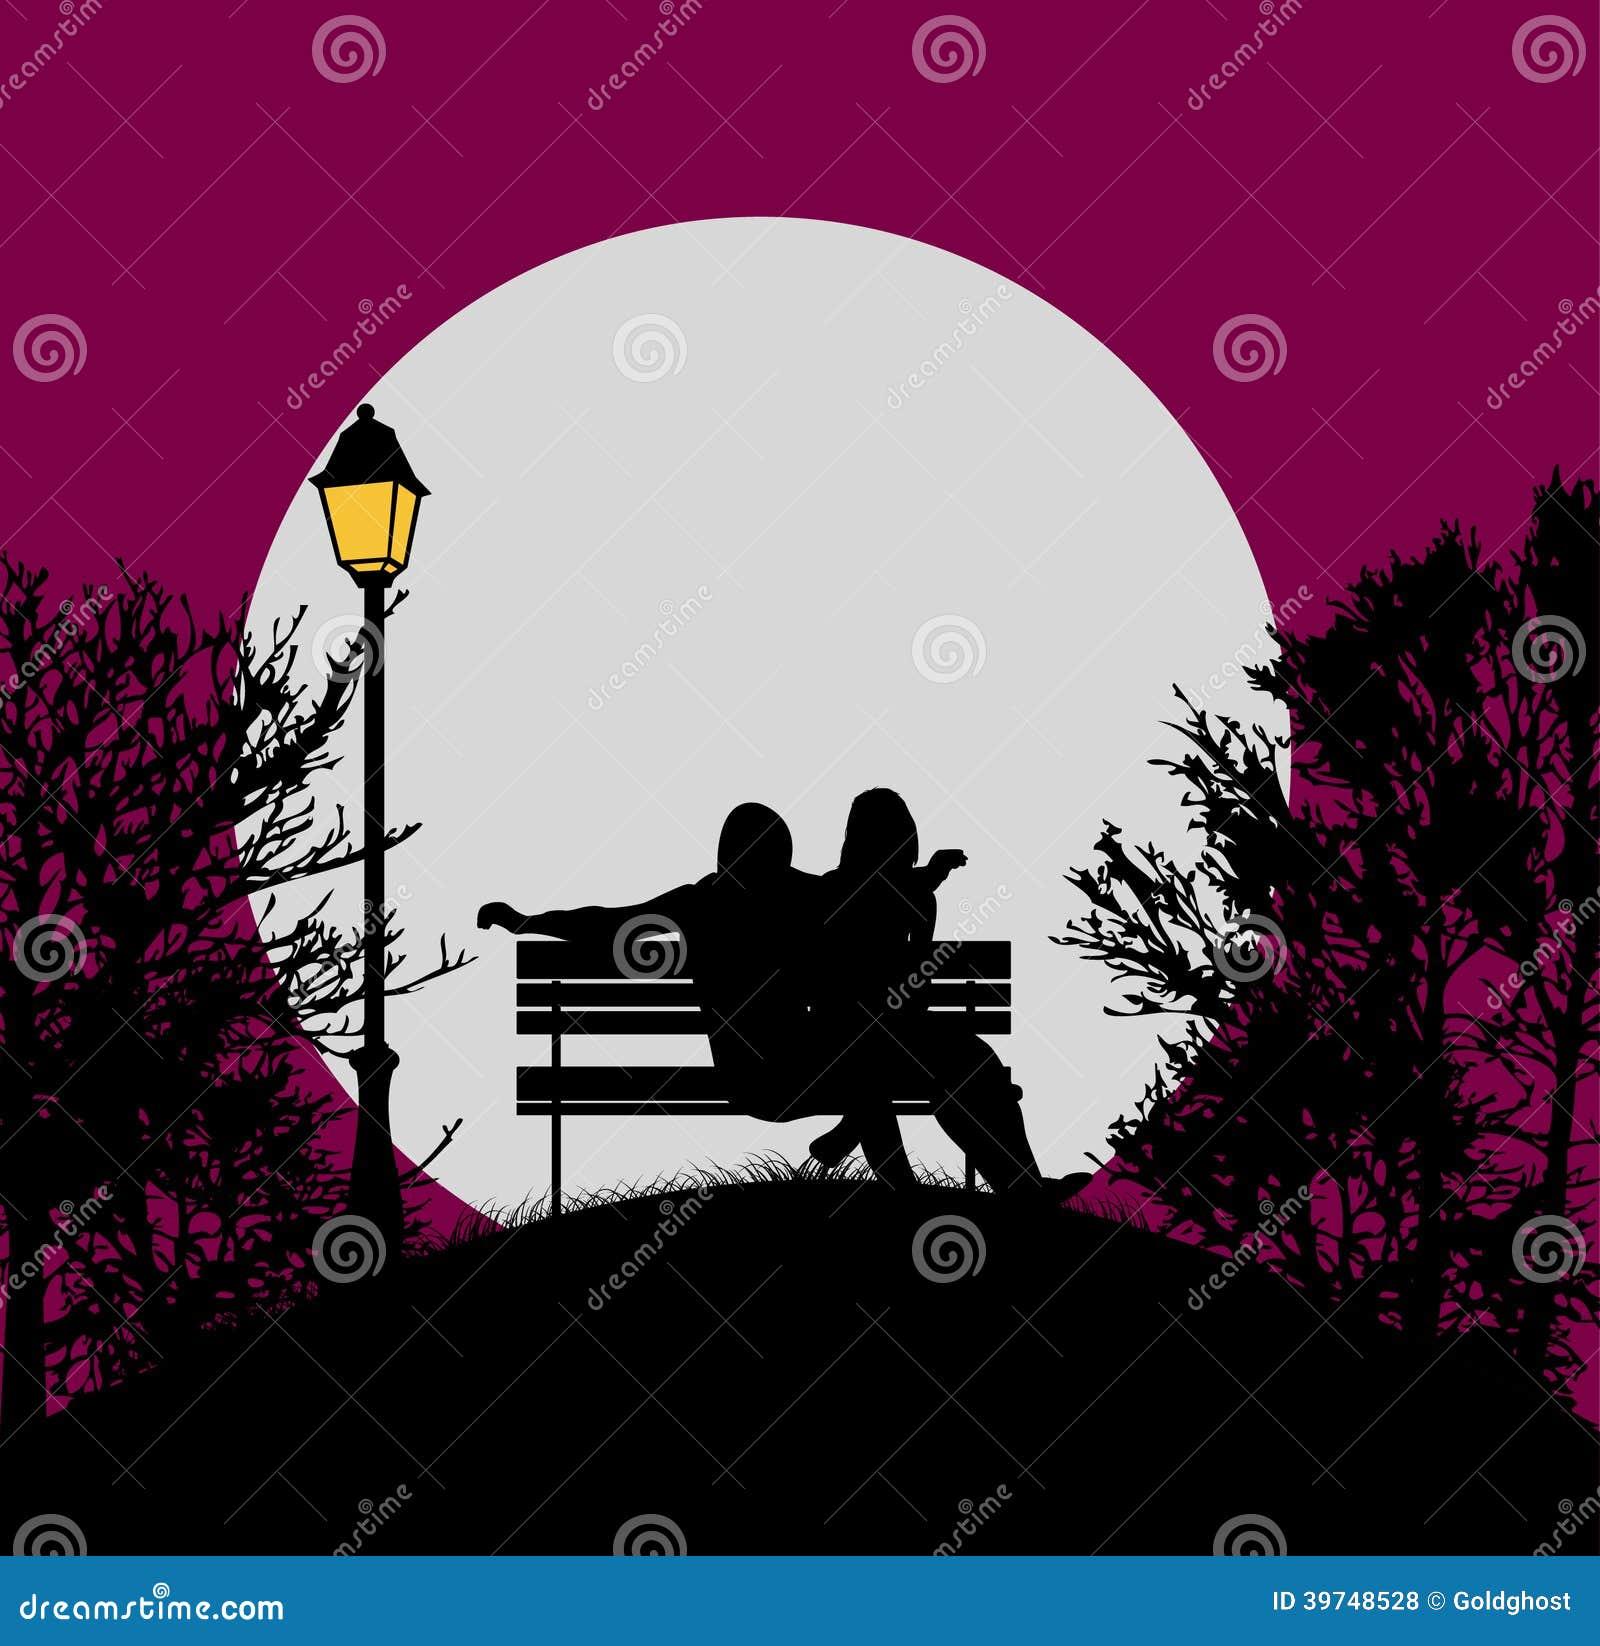 Romantic Evening In The Moonlight Stock Vector - Image ...